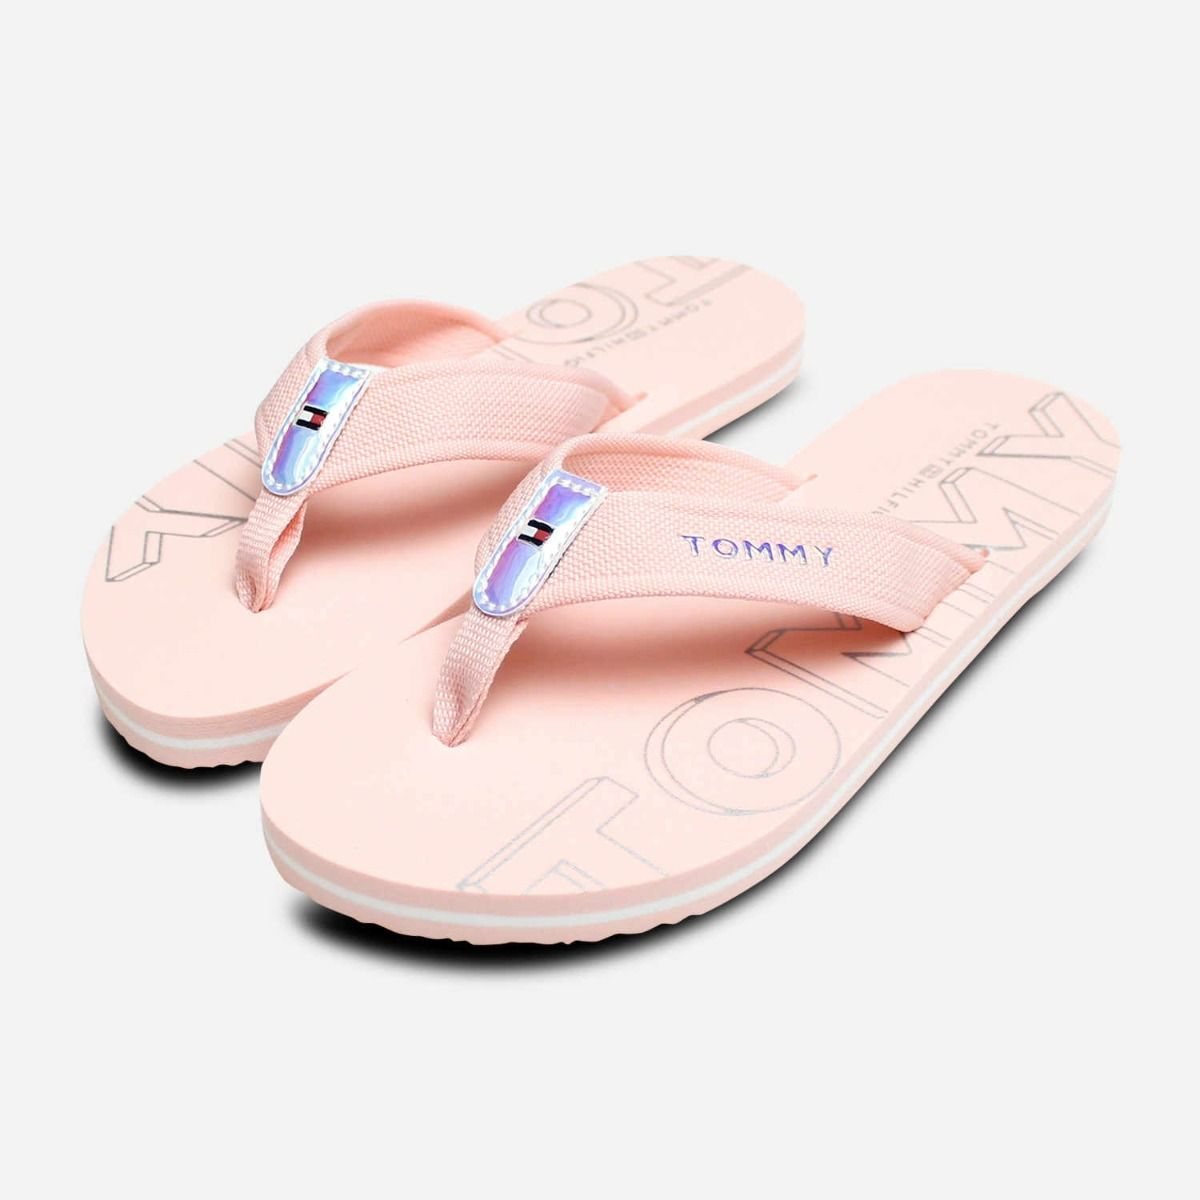 8fab0dbd Tommy Hilfiger Pink Iridescent Womens Flip Flop Sandal